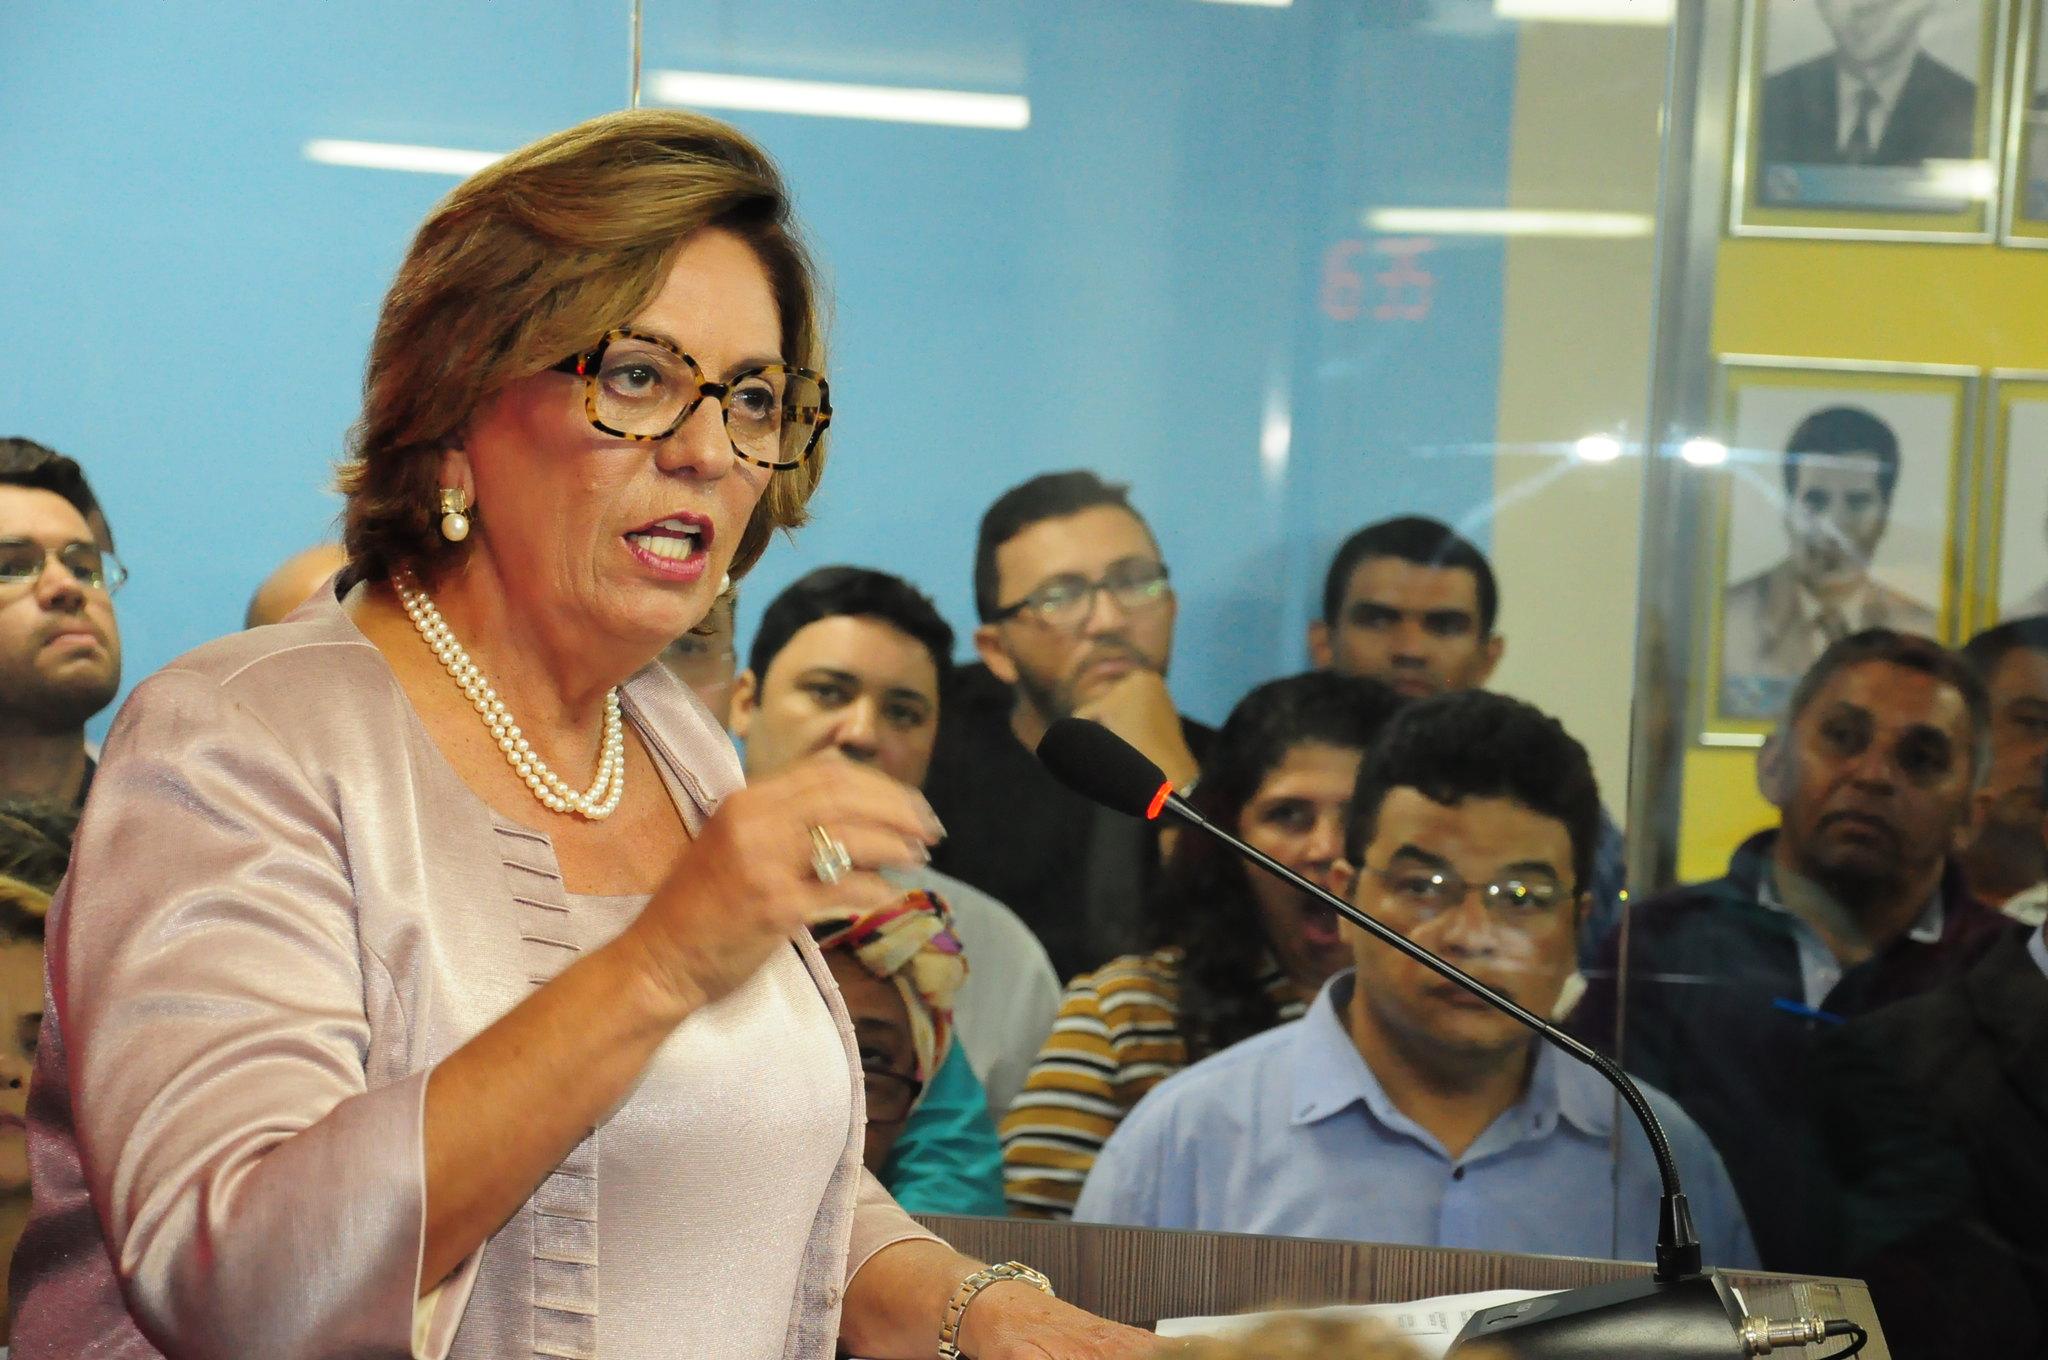 Prefeita Rosalba Ciarlini vai a Brasília para audiência no Ministério da Justiça